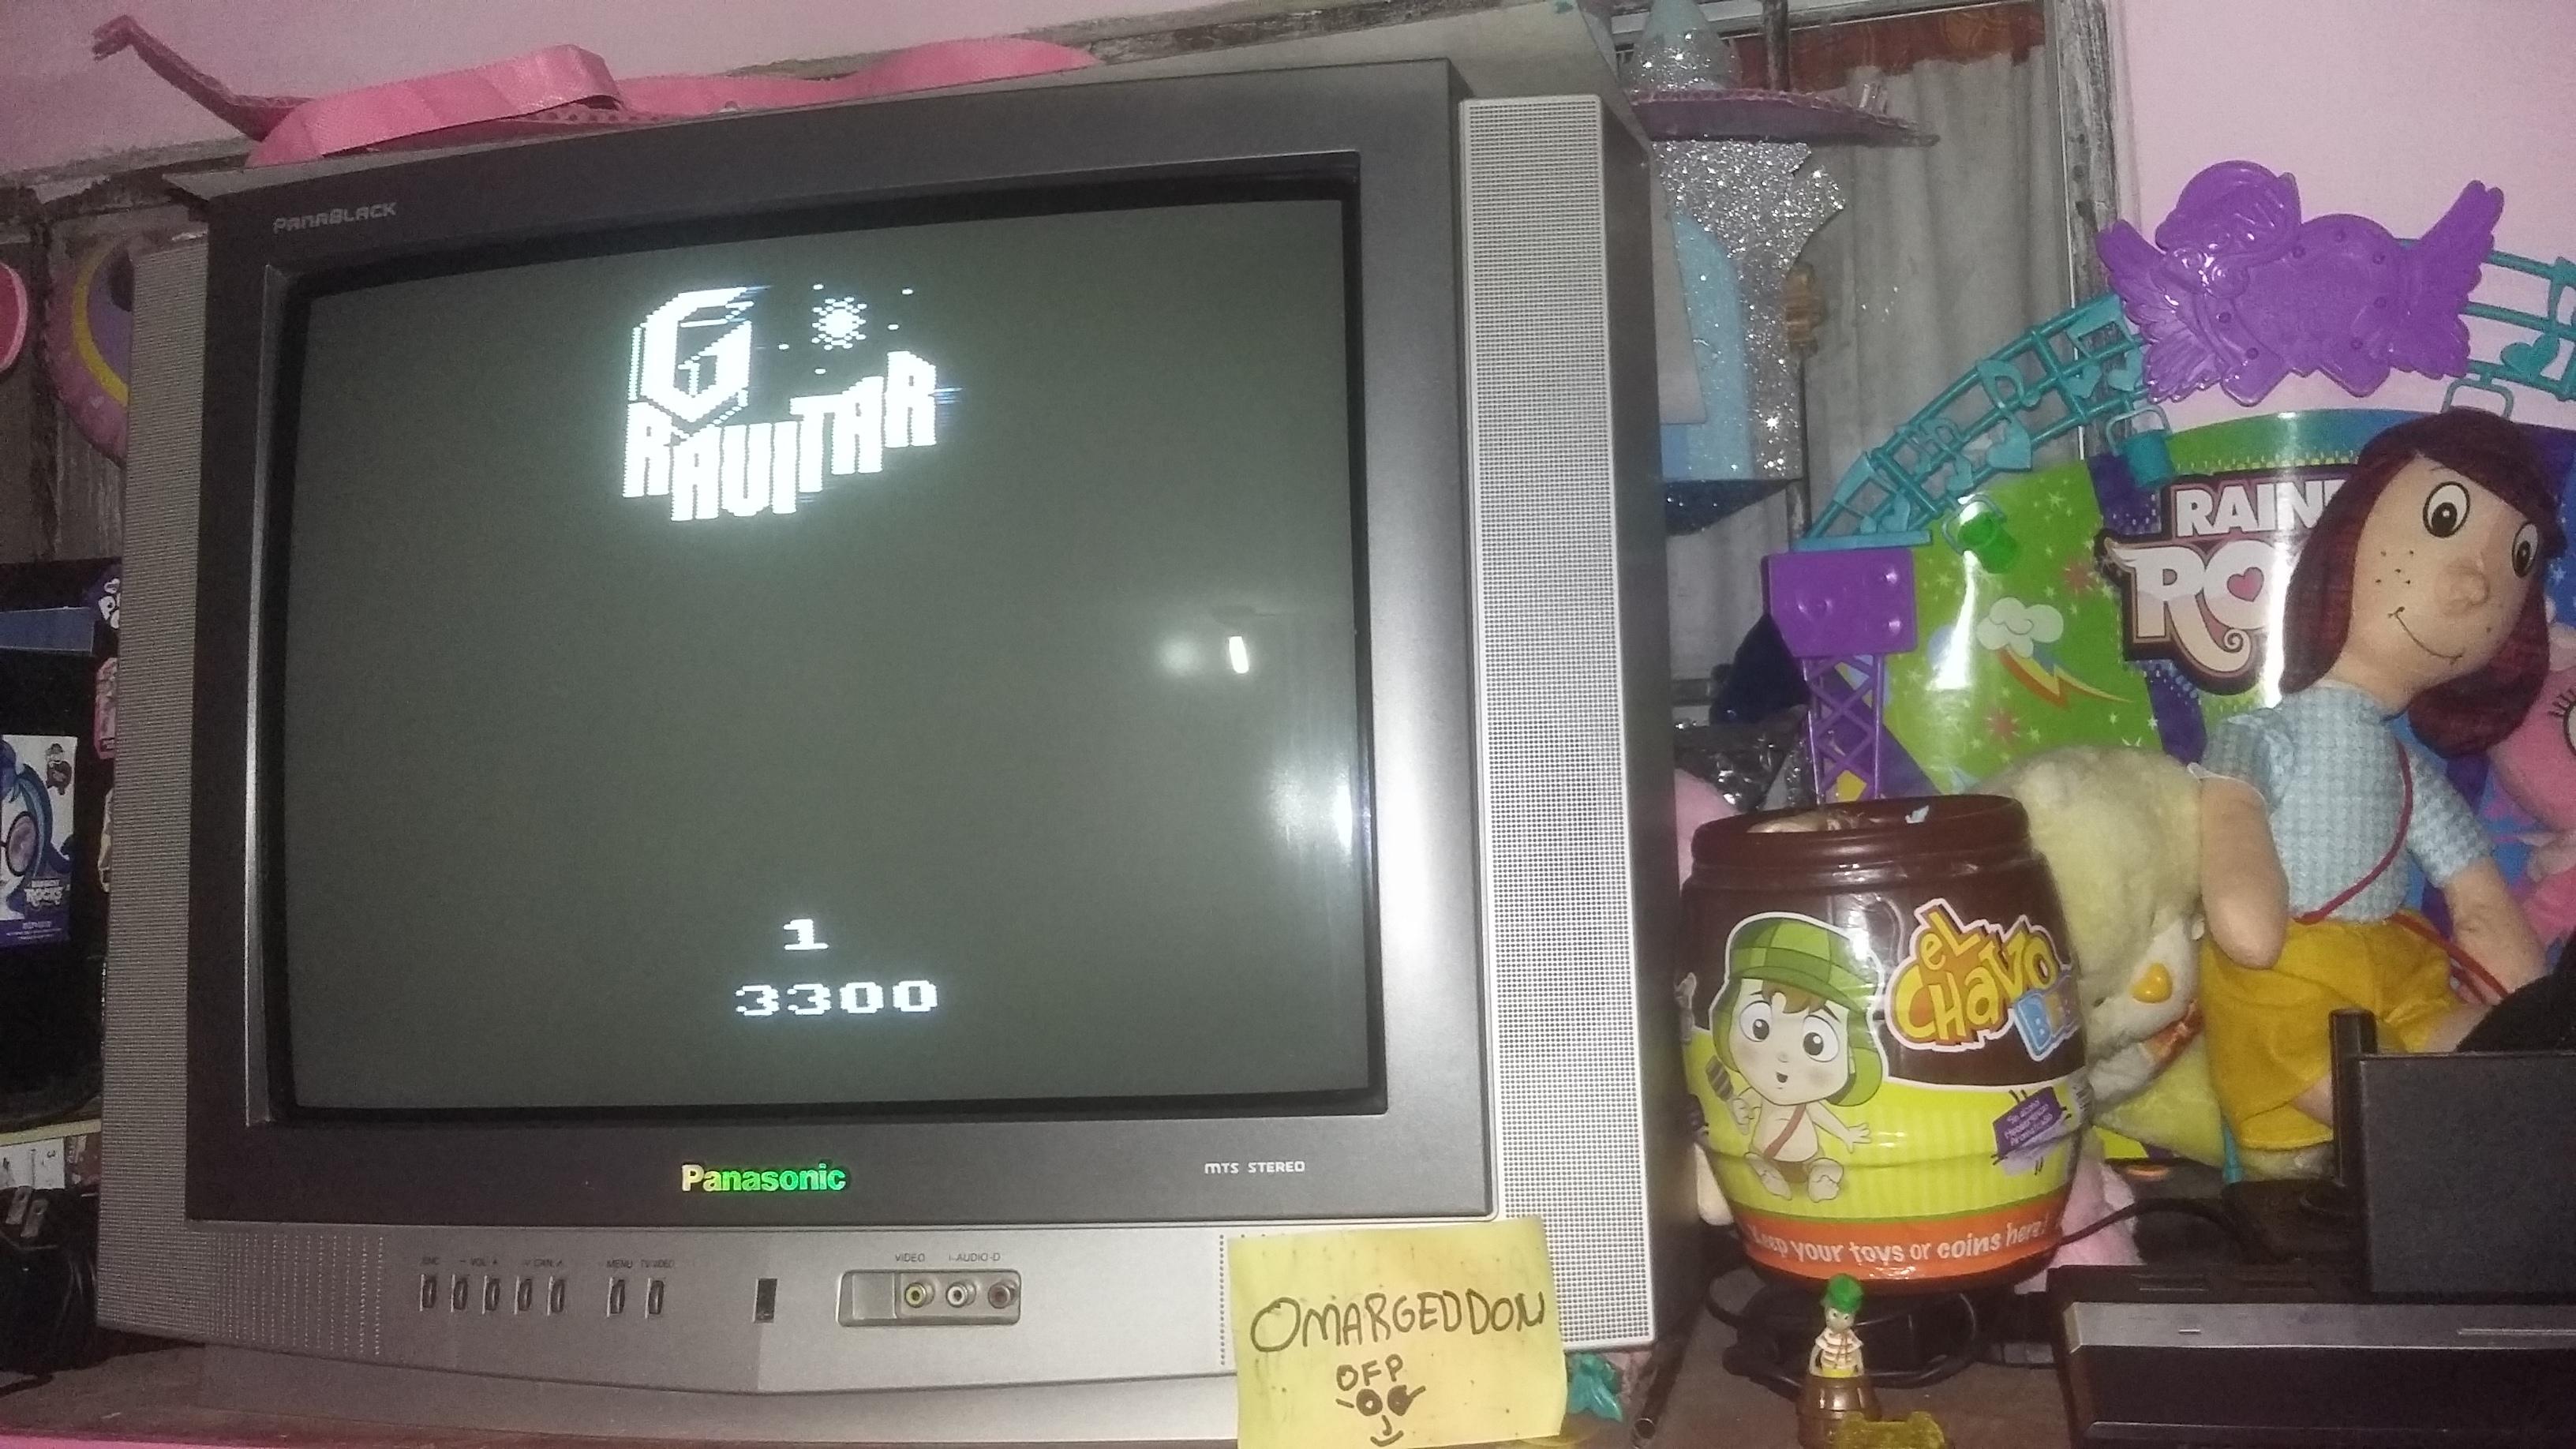 omargeddon: Gravitar (Atari 2600 Novice/B) 3,300 points on 2016-12-17 18:30:48